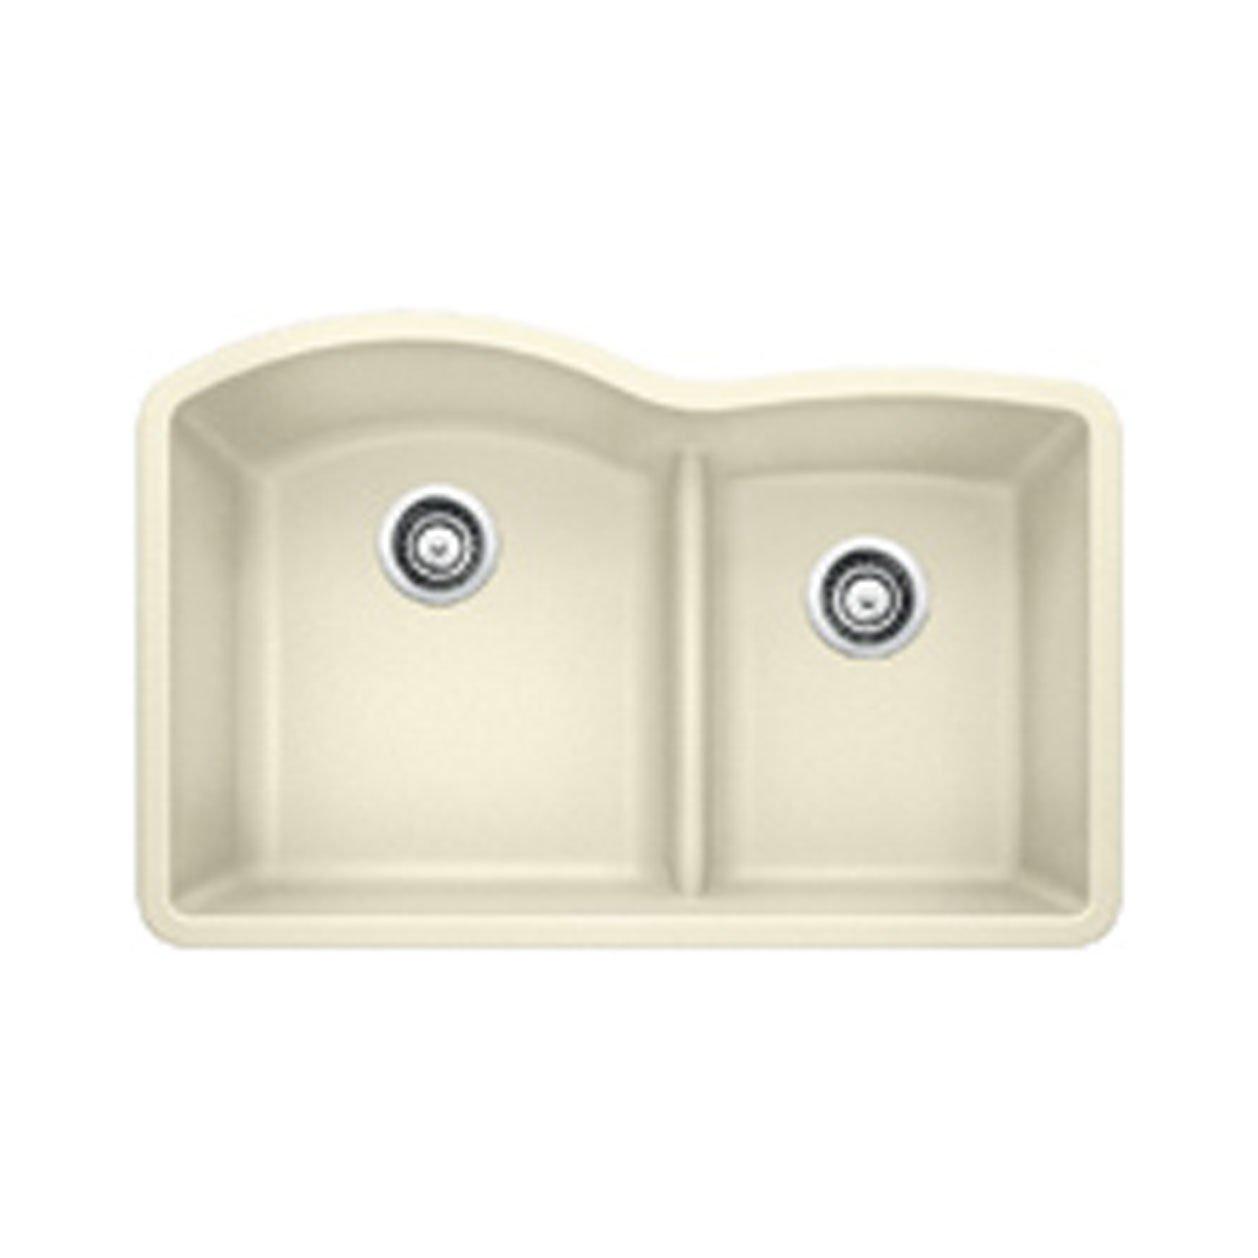 Large Bowl Kitchen Sink Blanco 441594 diamond 175 low divide under mount double bowl blanco 441594 diamond 175 low divide under mount double bowl kitchen sink large biscuit amazon workwithnaturefo